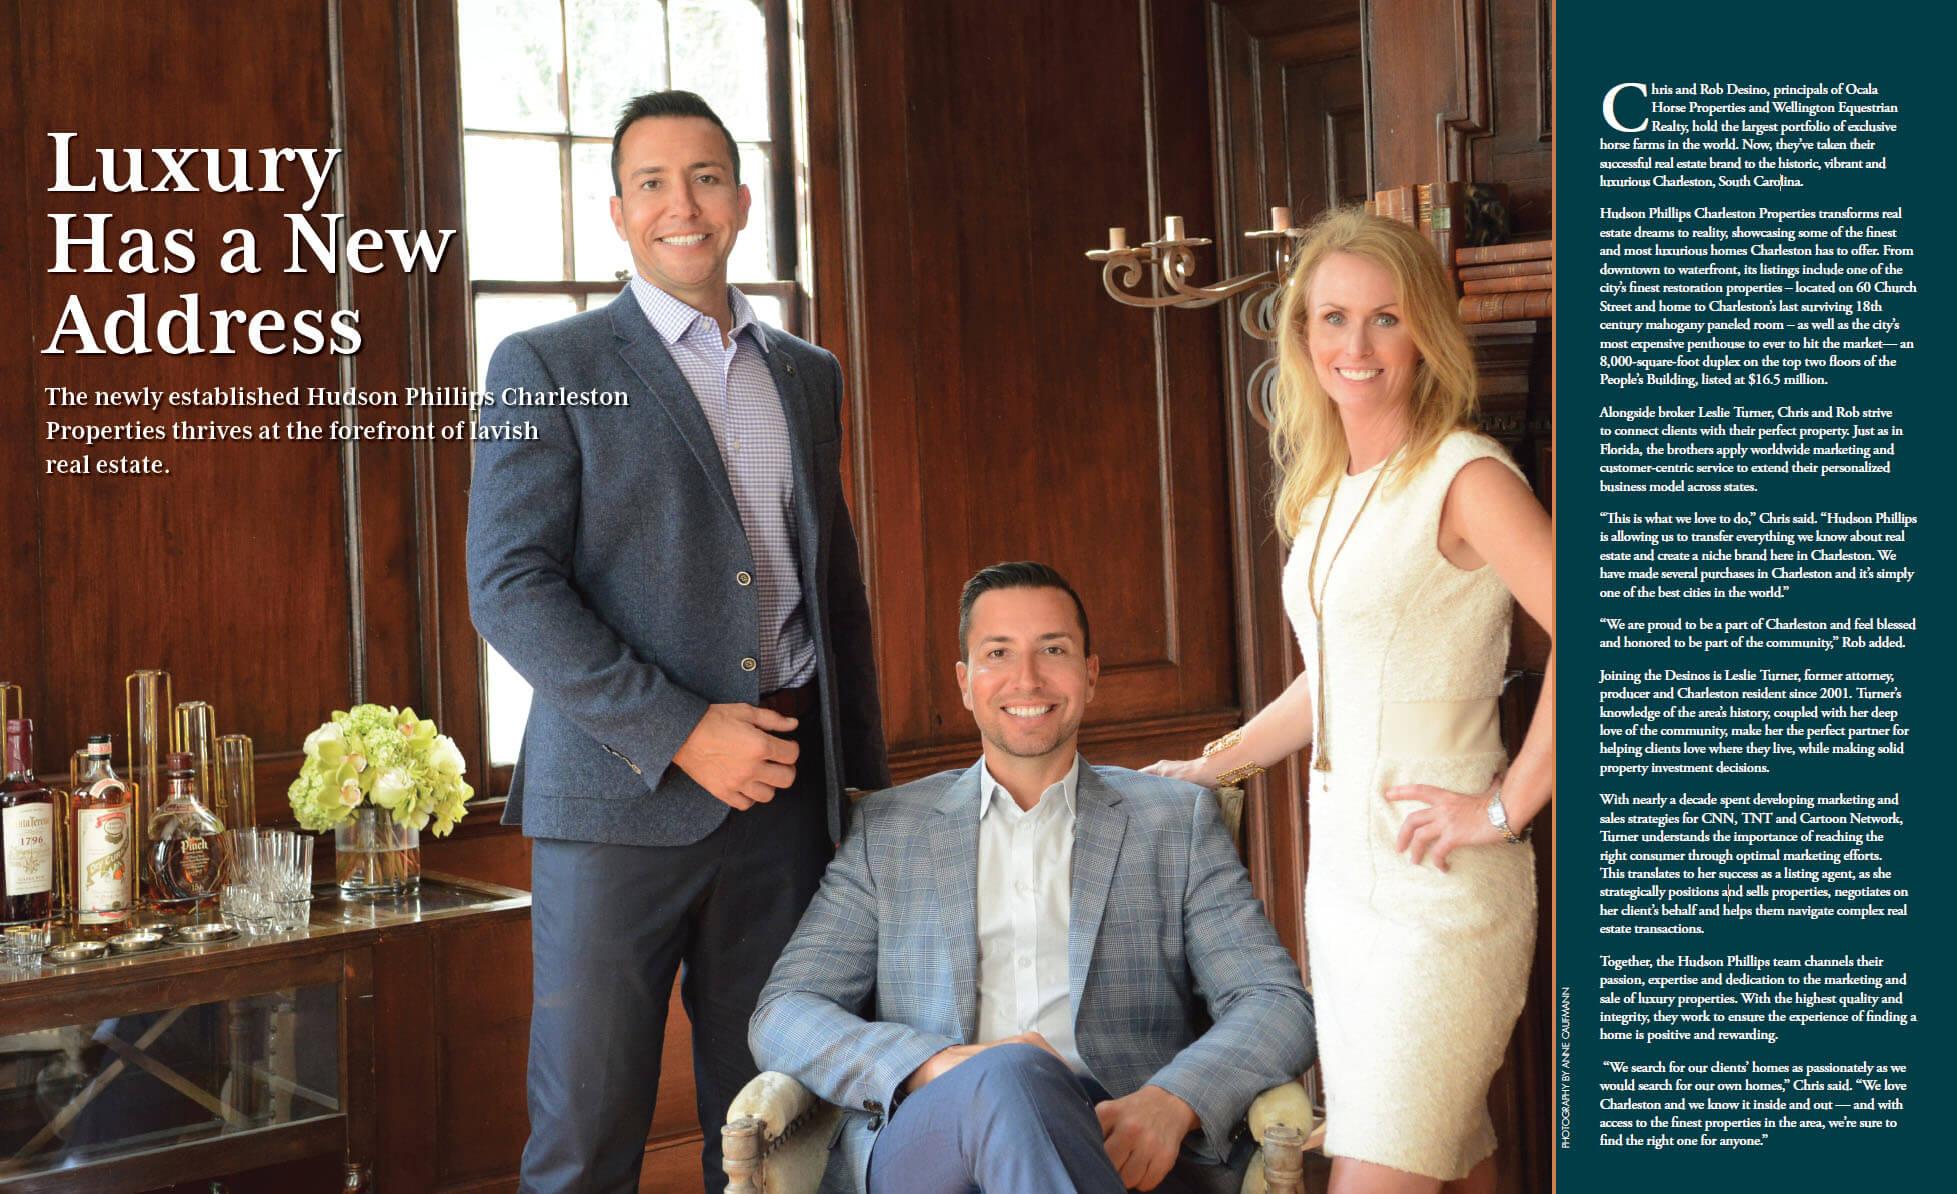 Luxury Has A New Address - Hudson Phillips Properties